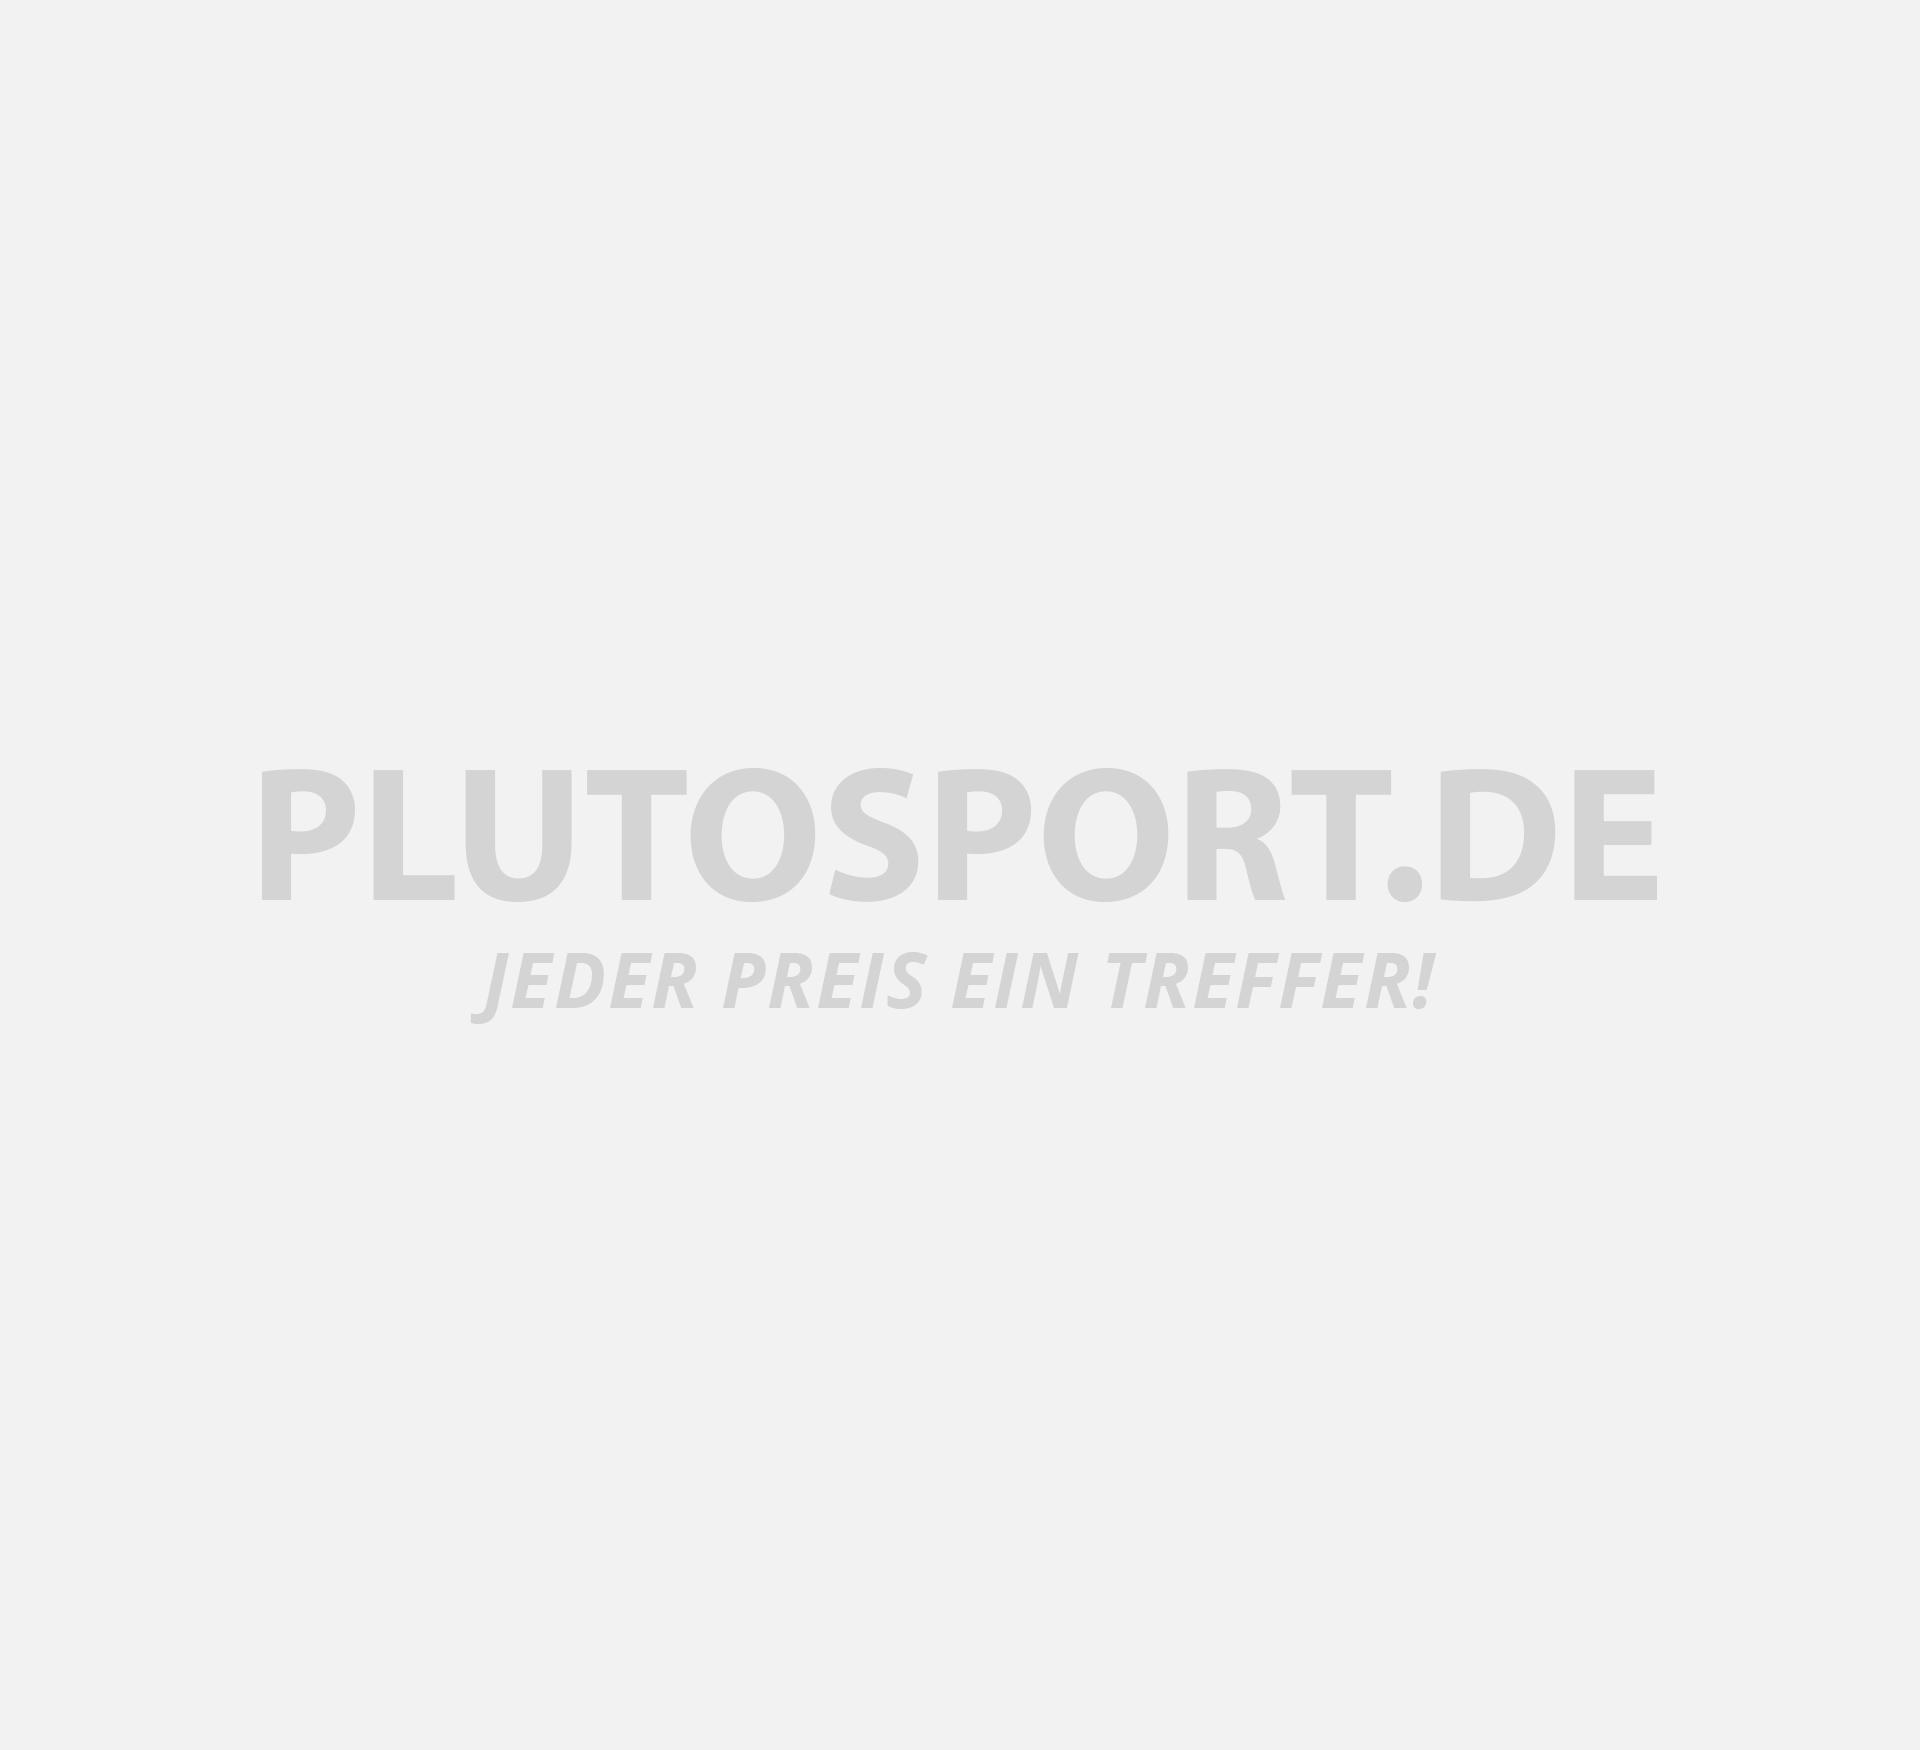 Nike Brief Boxershorts Herren (3-Pack)